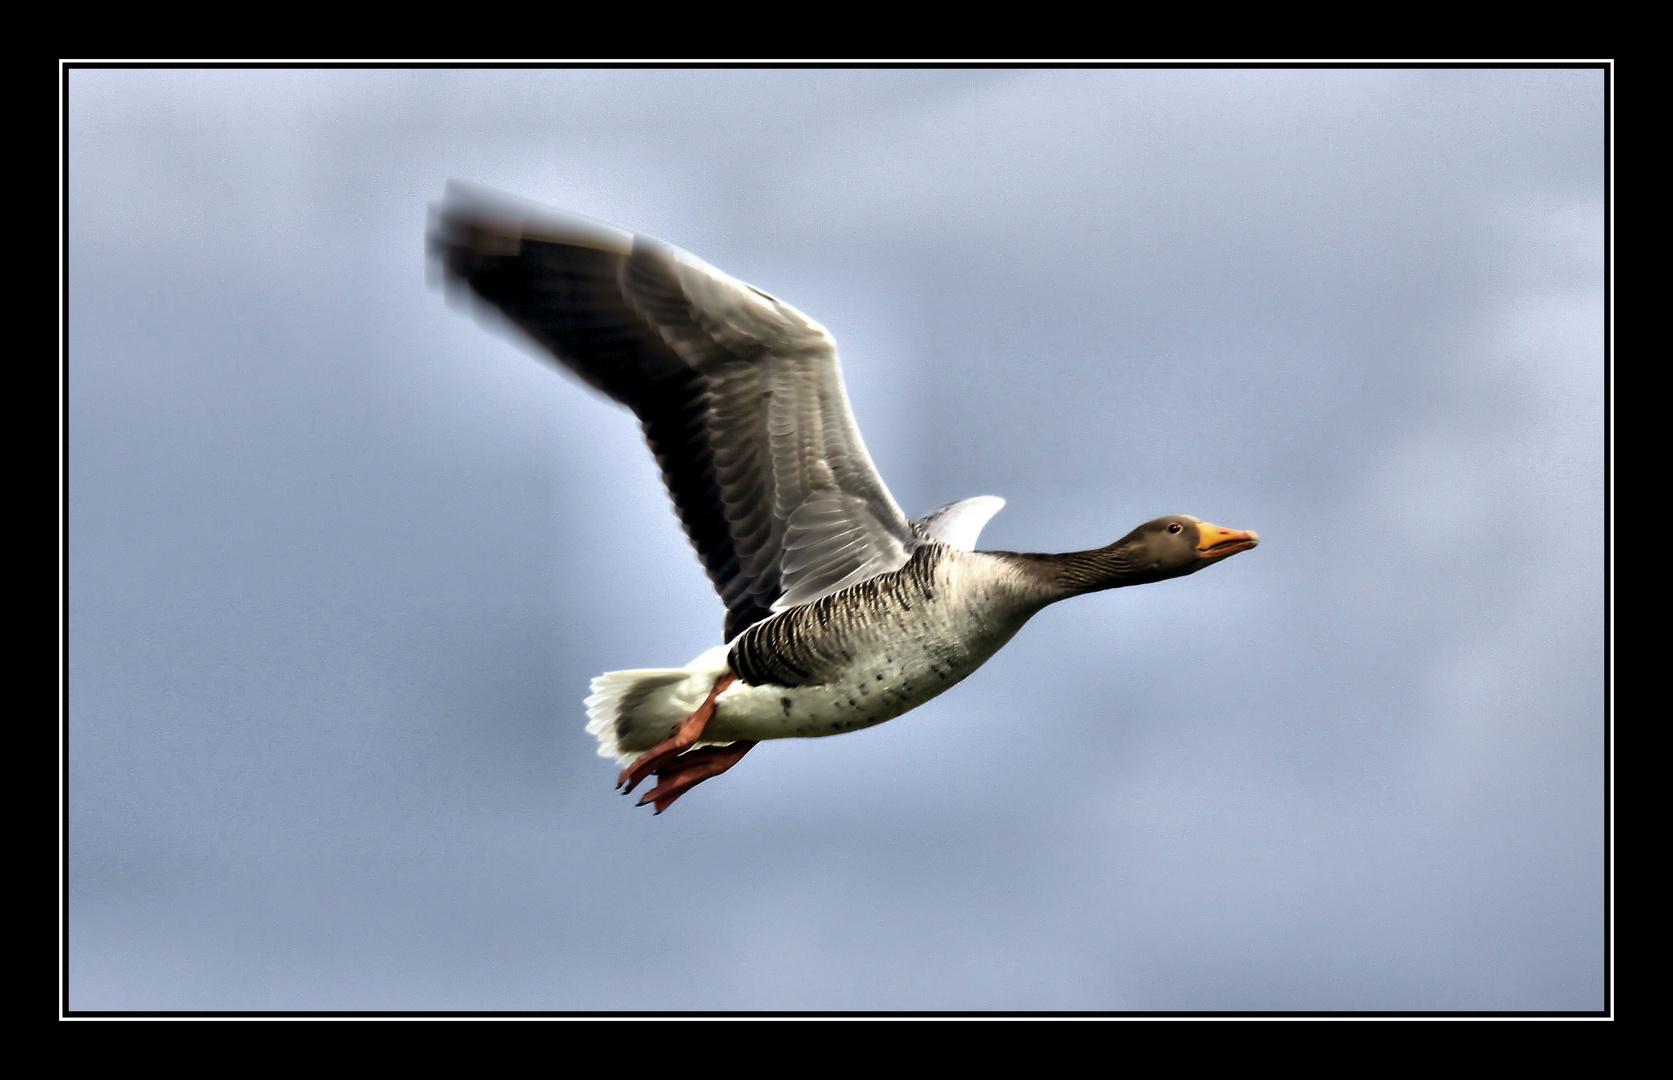 ...Flying